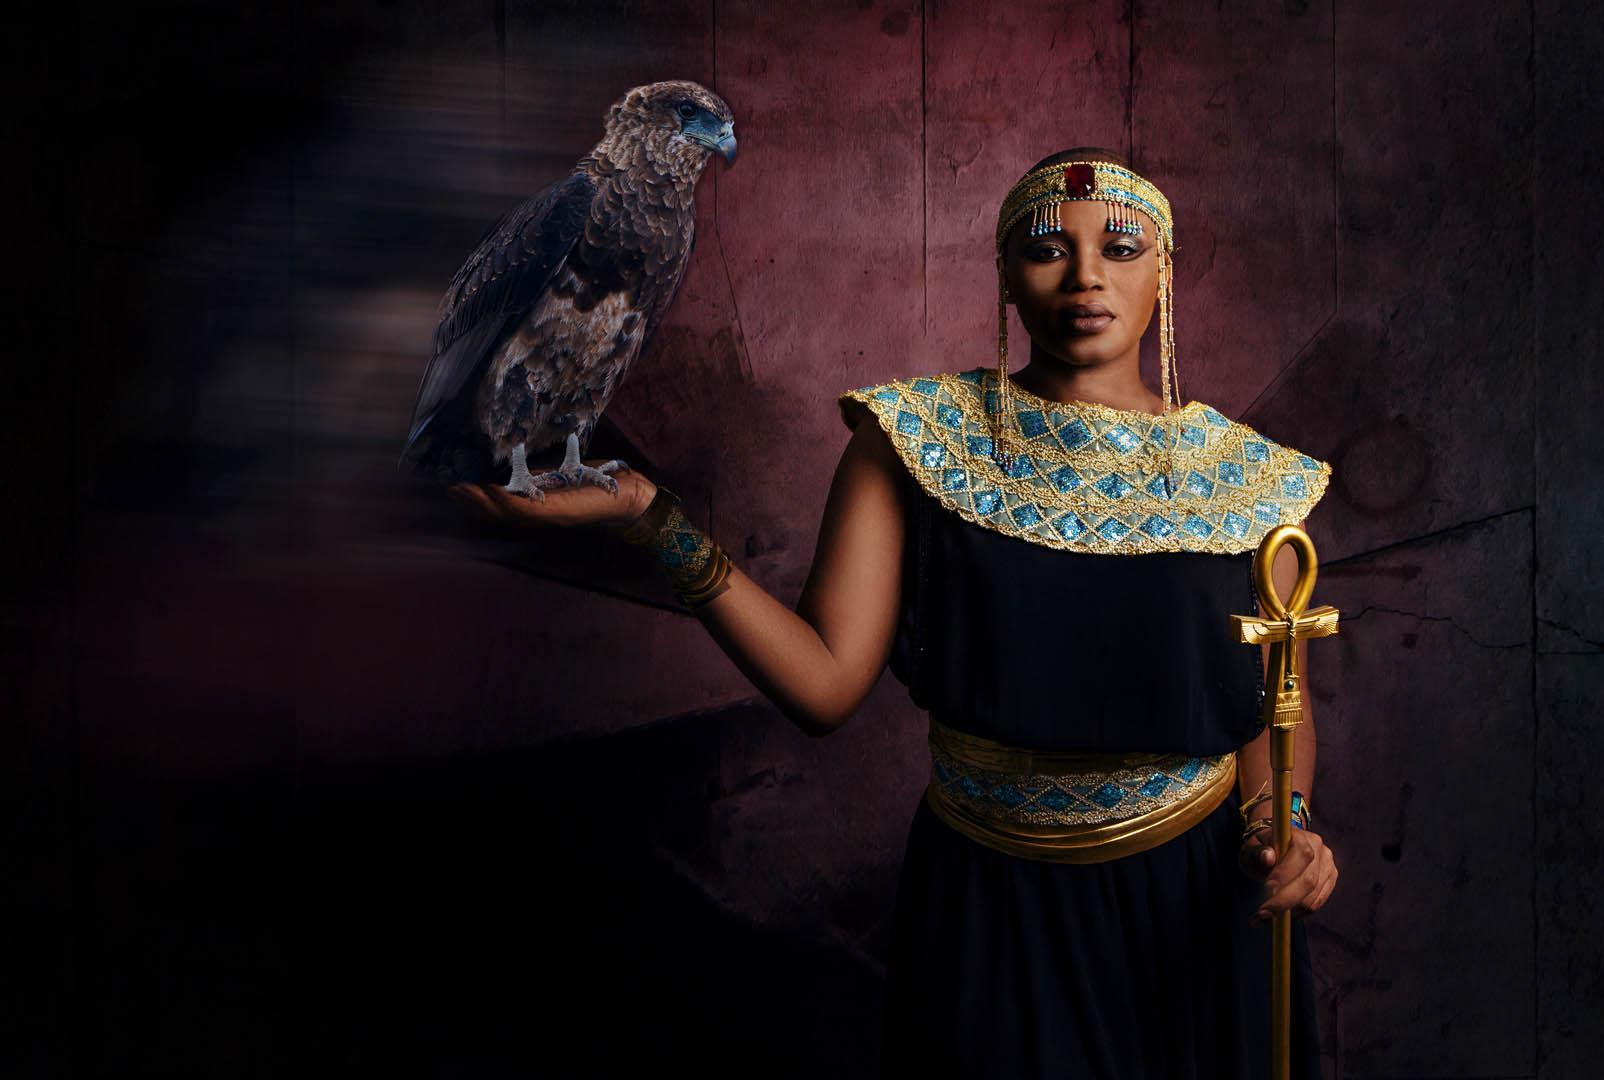 5_PI_Lady and the Eagle_Hanli Smit